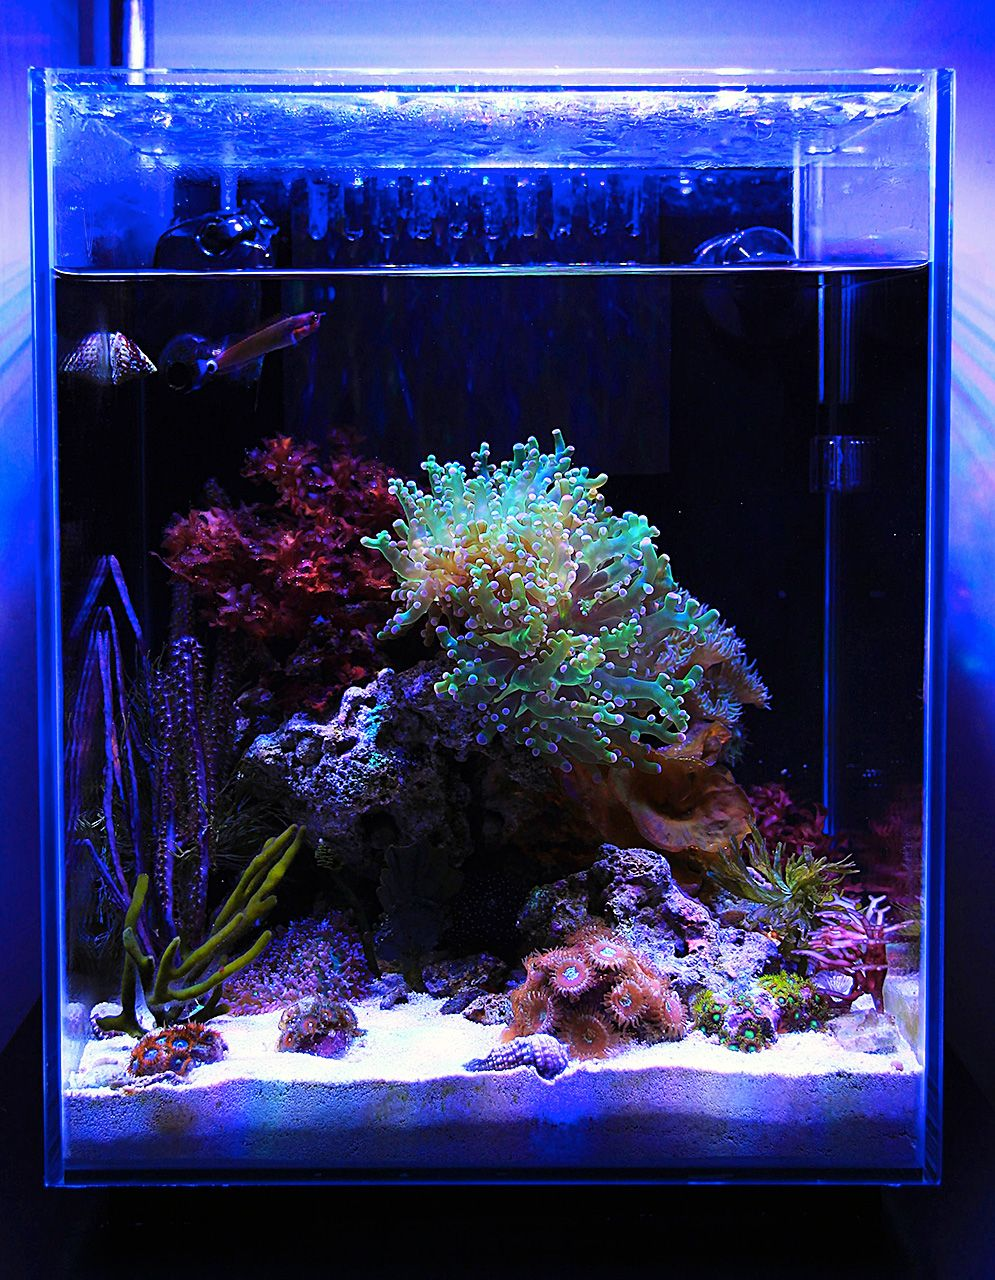 Justind823 2014 Featured Nano Reefs Featured Aquariums Monthly Featured Nano Reef Aquarium Prof Saltwater Aquarium Fish Coral Reef Aquarium Reef Aquarium